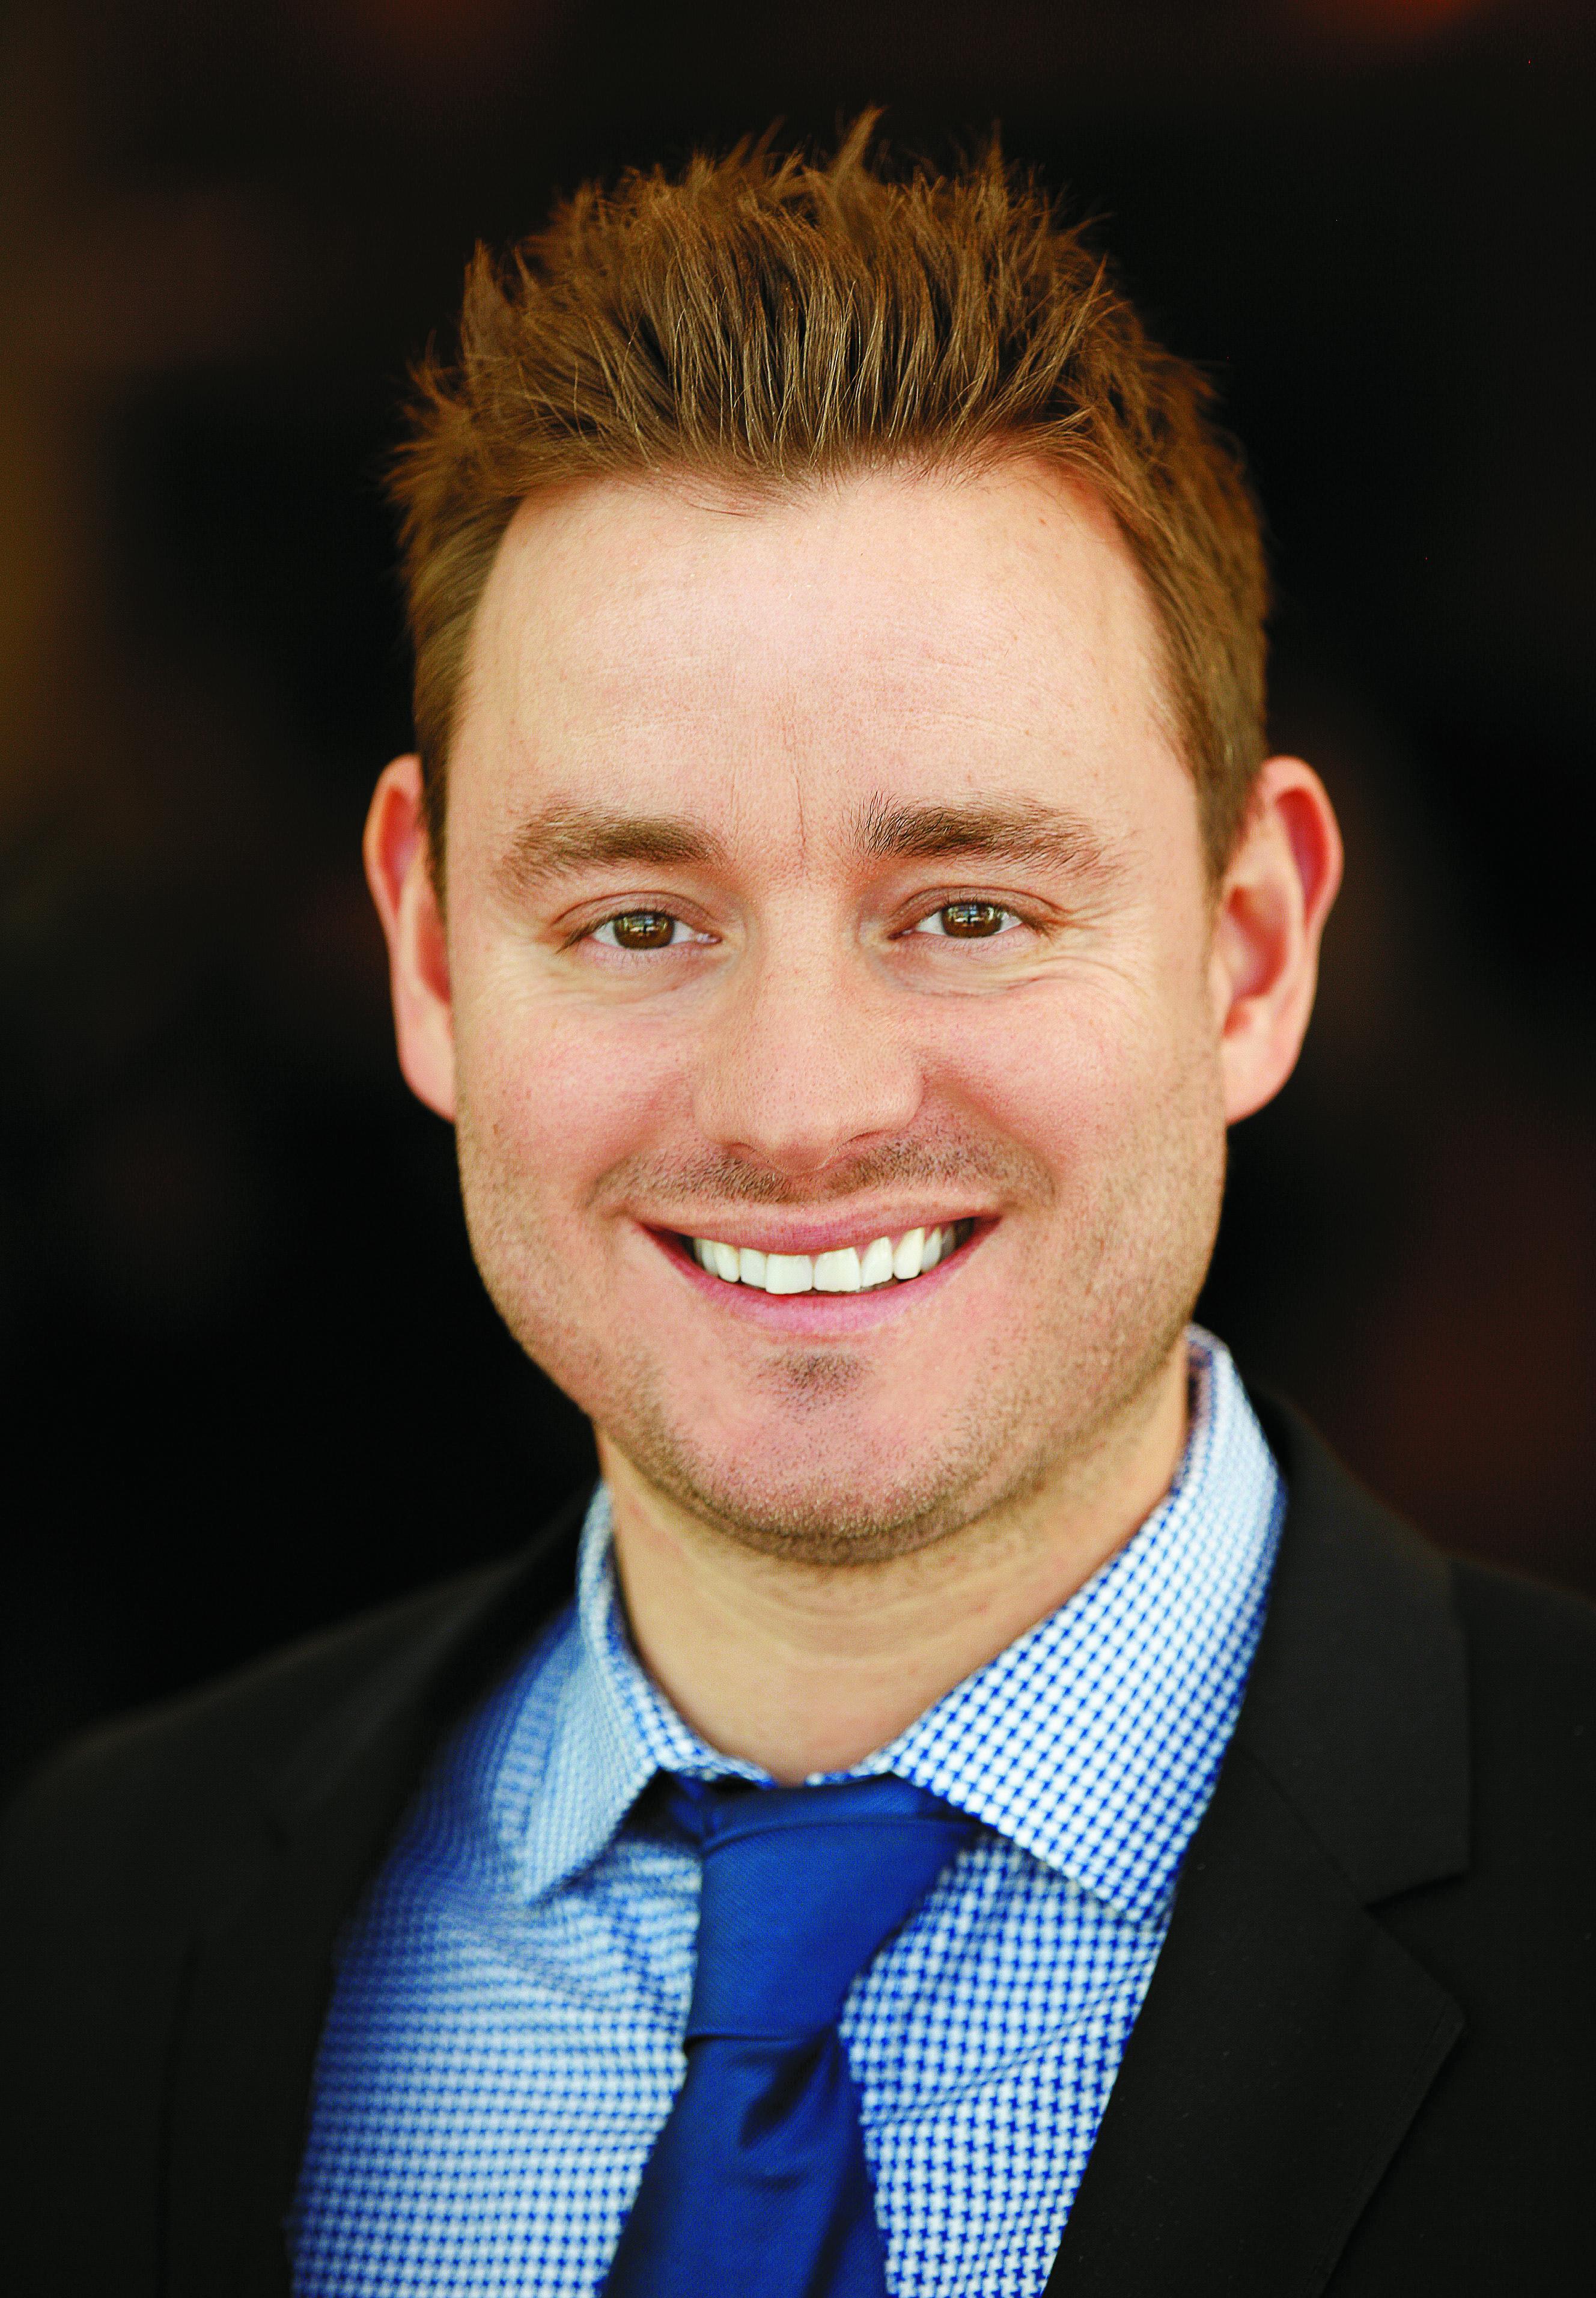 Jason Yates, Vice President of Marketing, John Paul Mitchell Systems